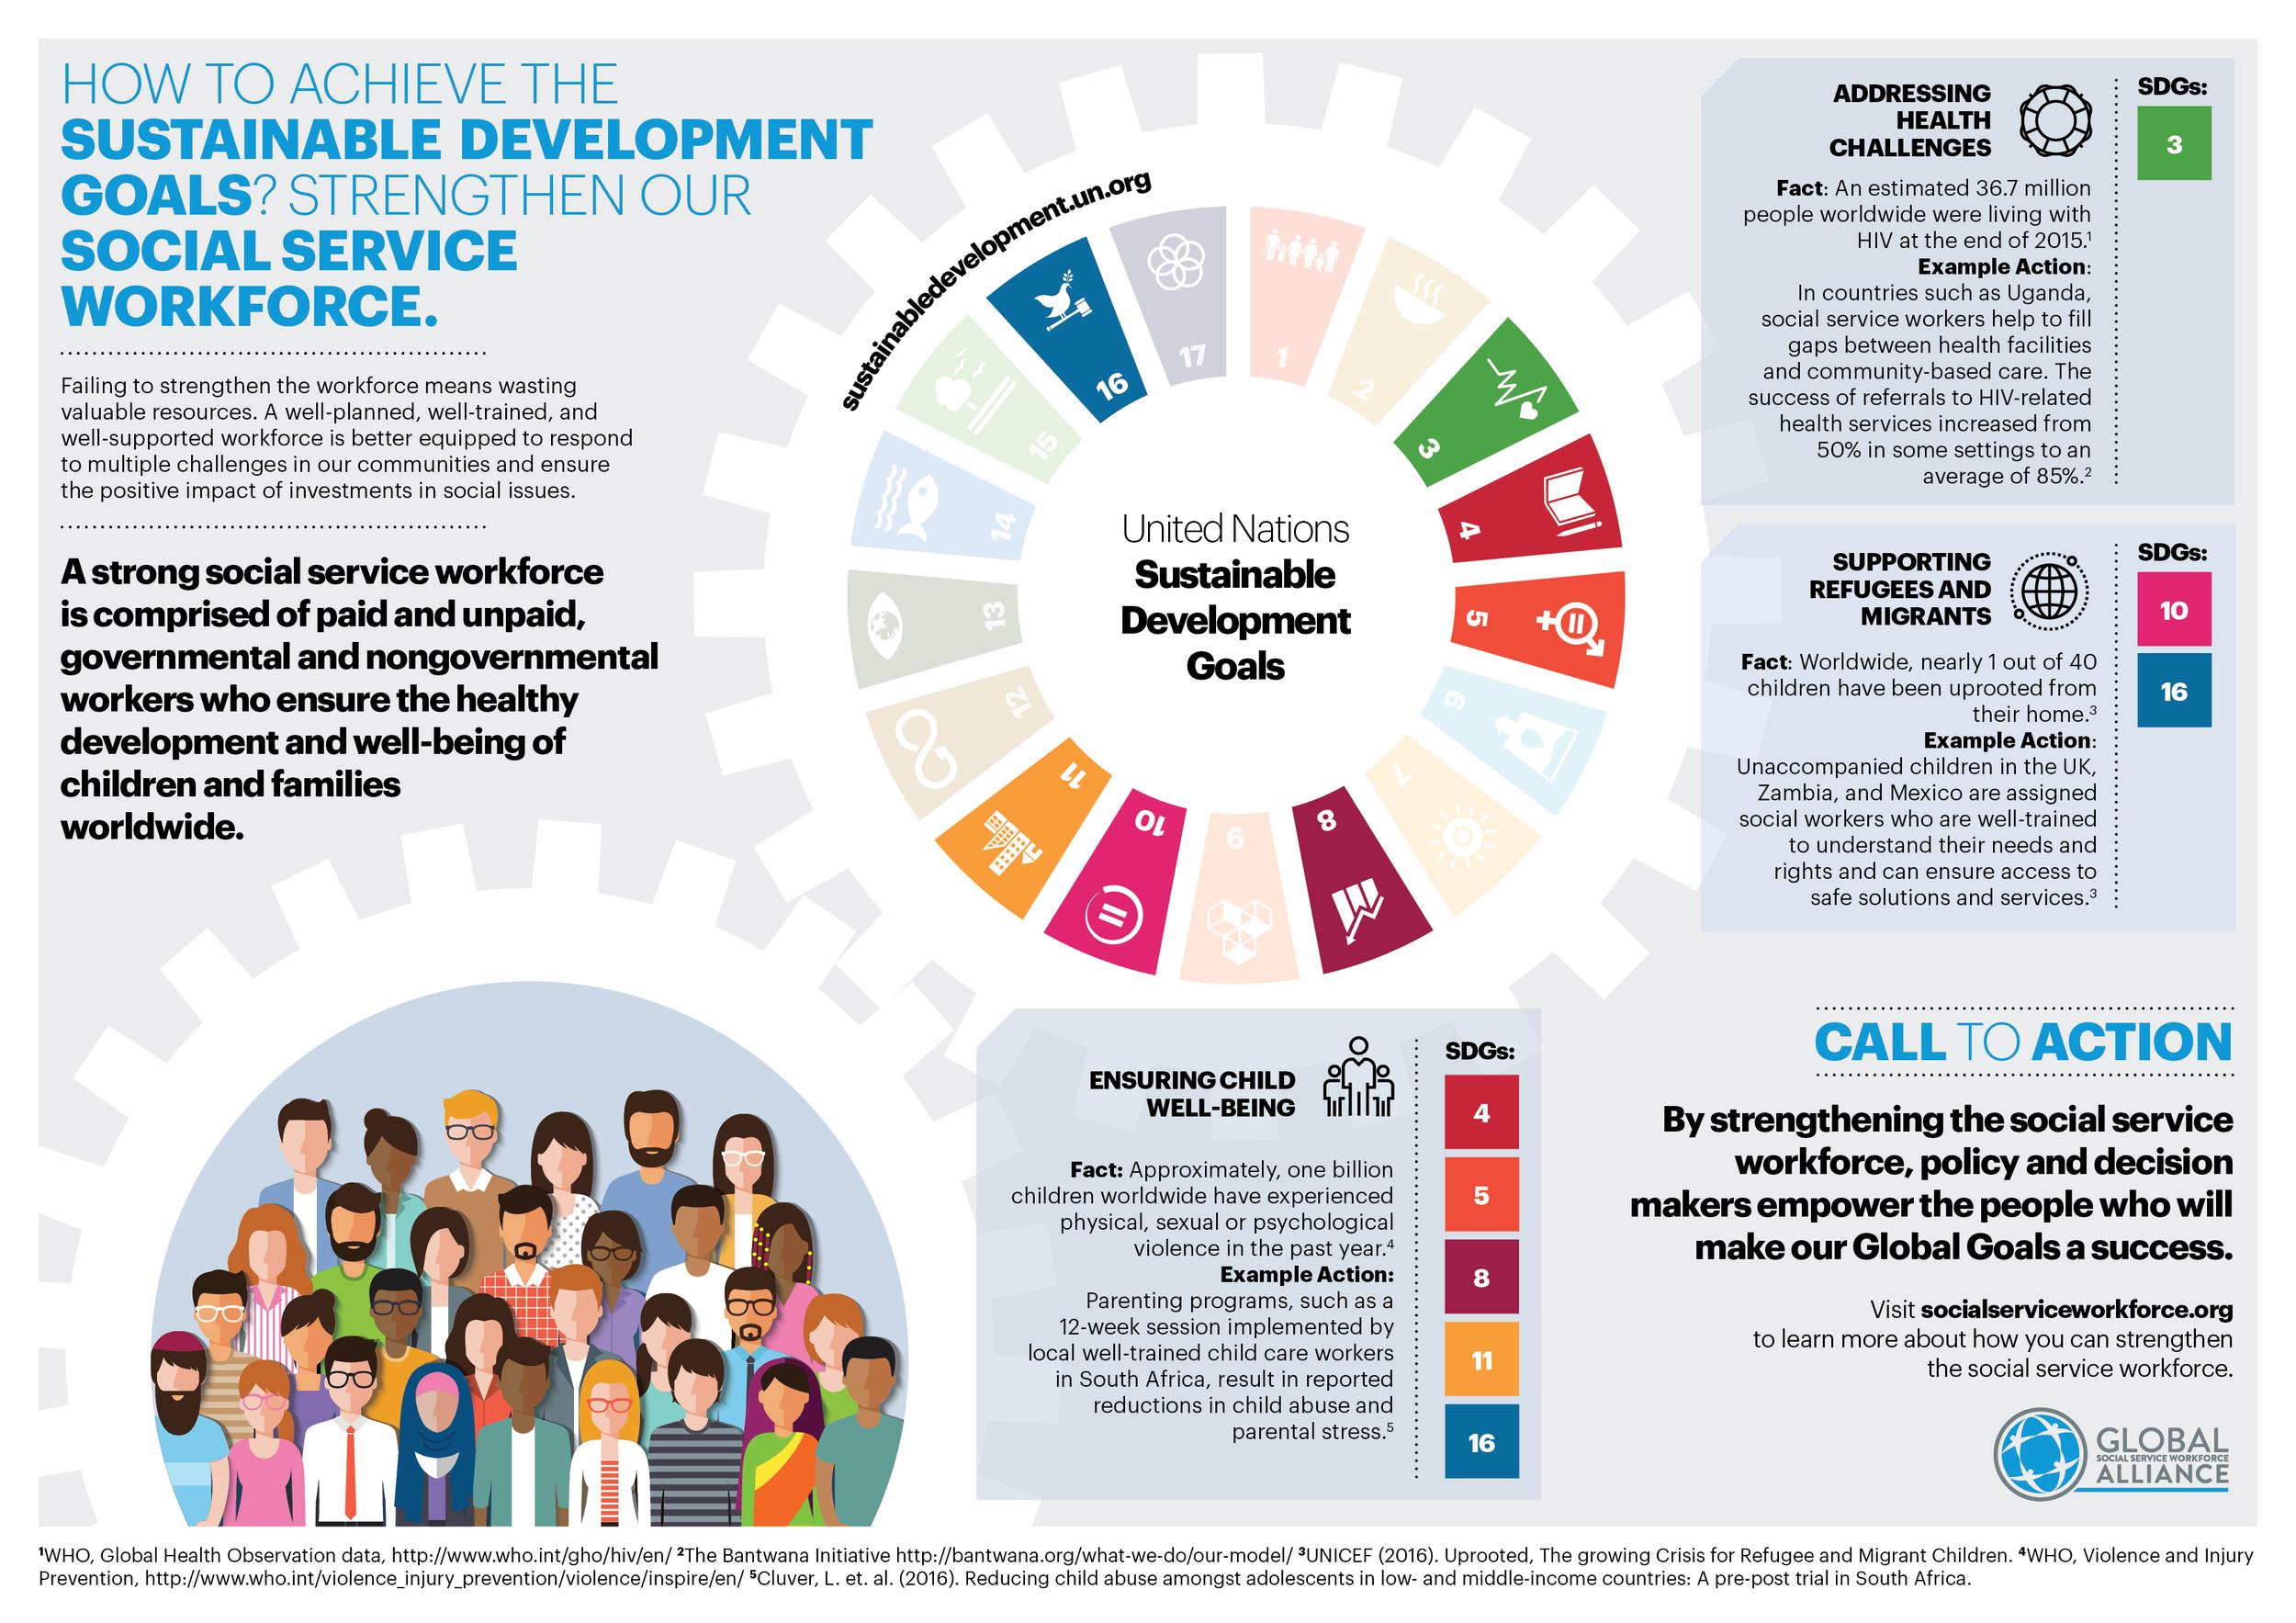 SocialServiceWorkforce_SDGs_Infographic.png